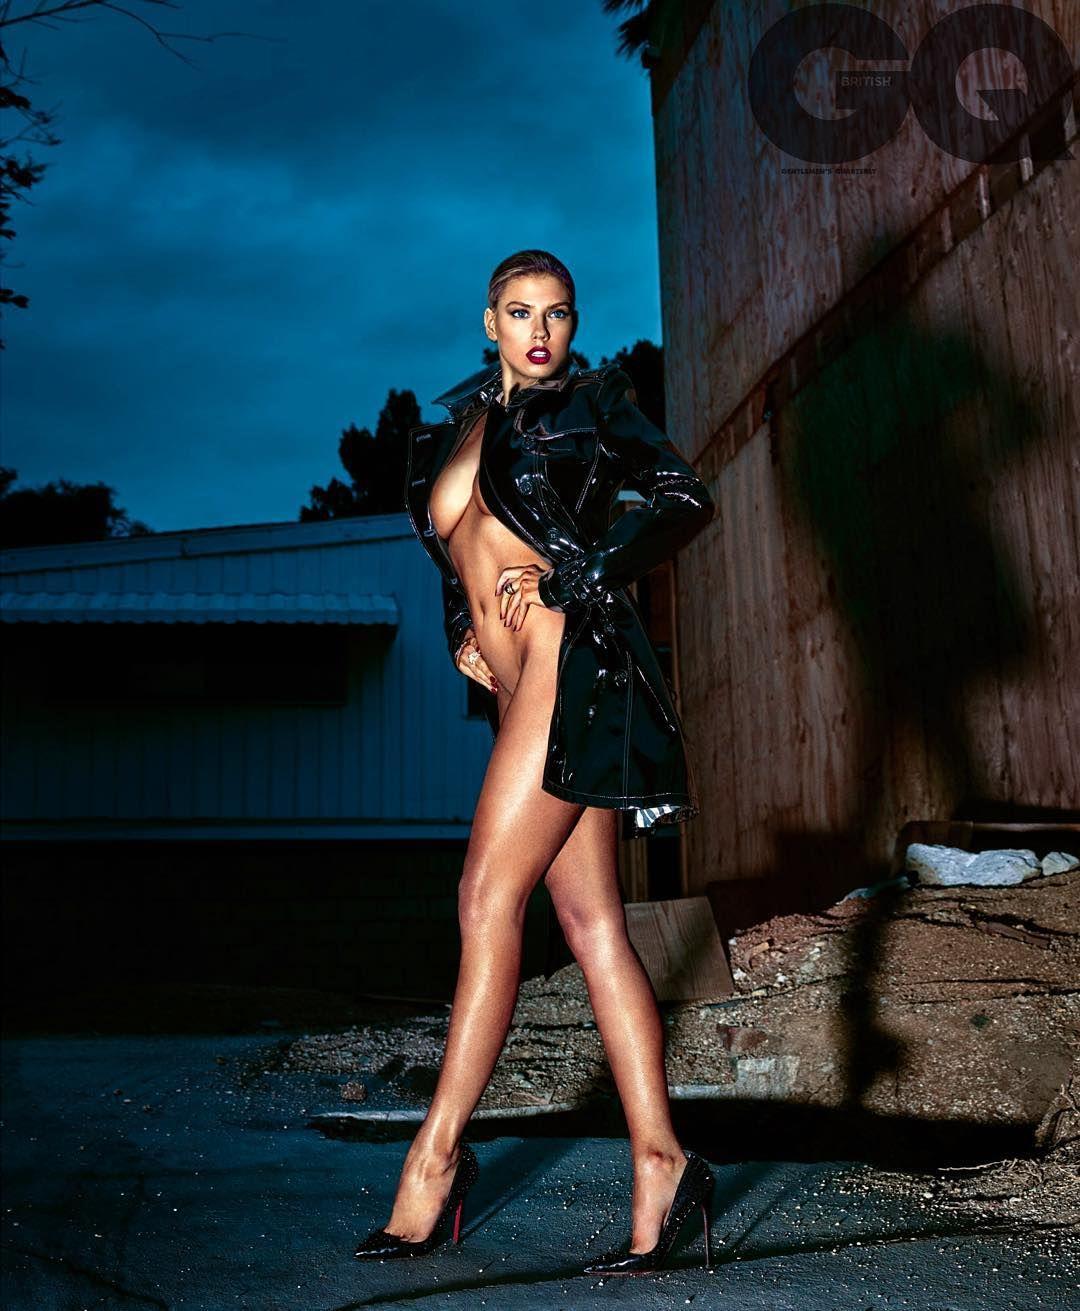 24a2a50770ff3 Charlotte McKinney GQ Shoot | Charlotte McKinney | Charlotte ...